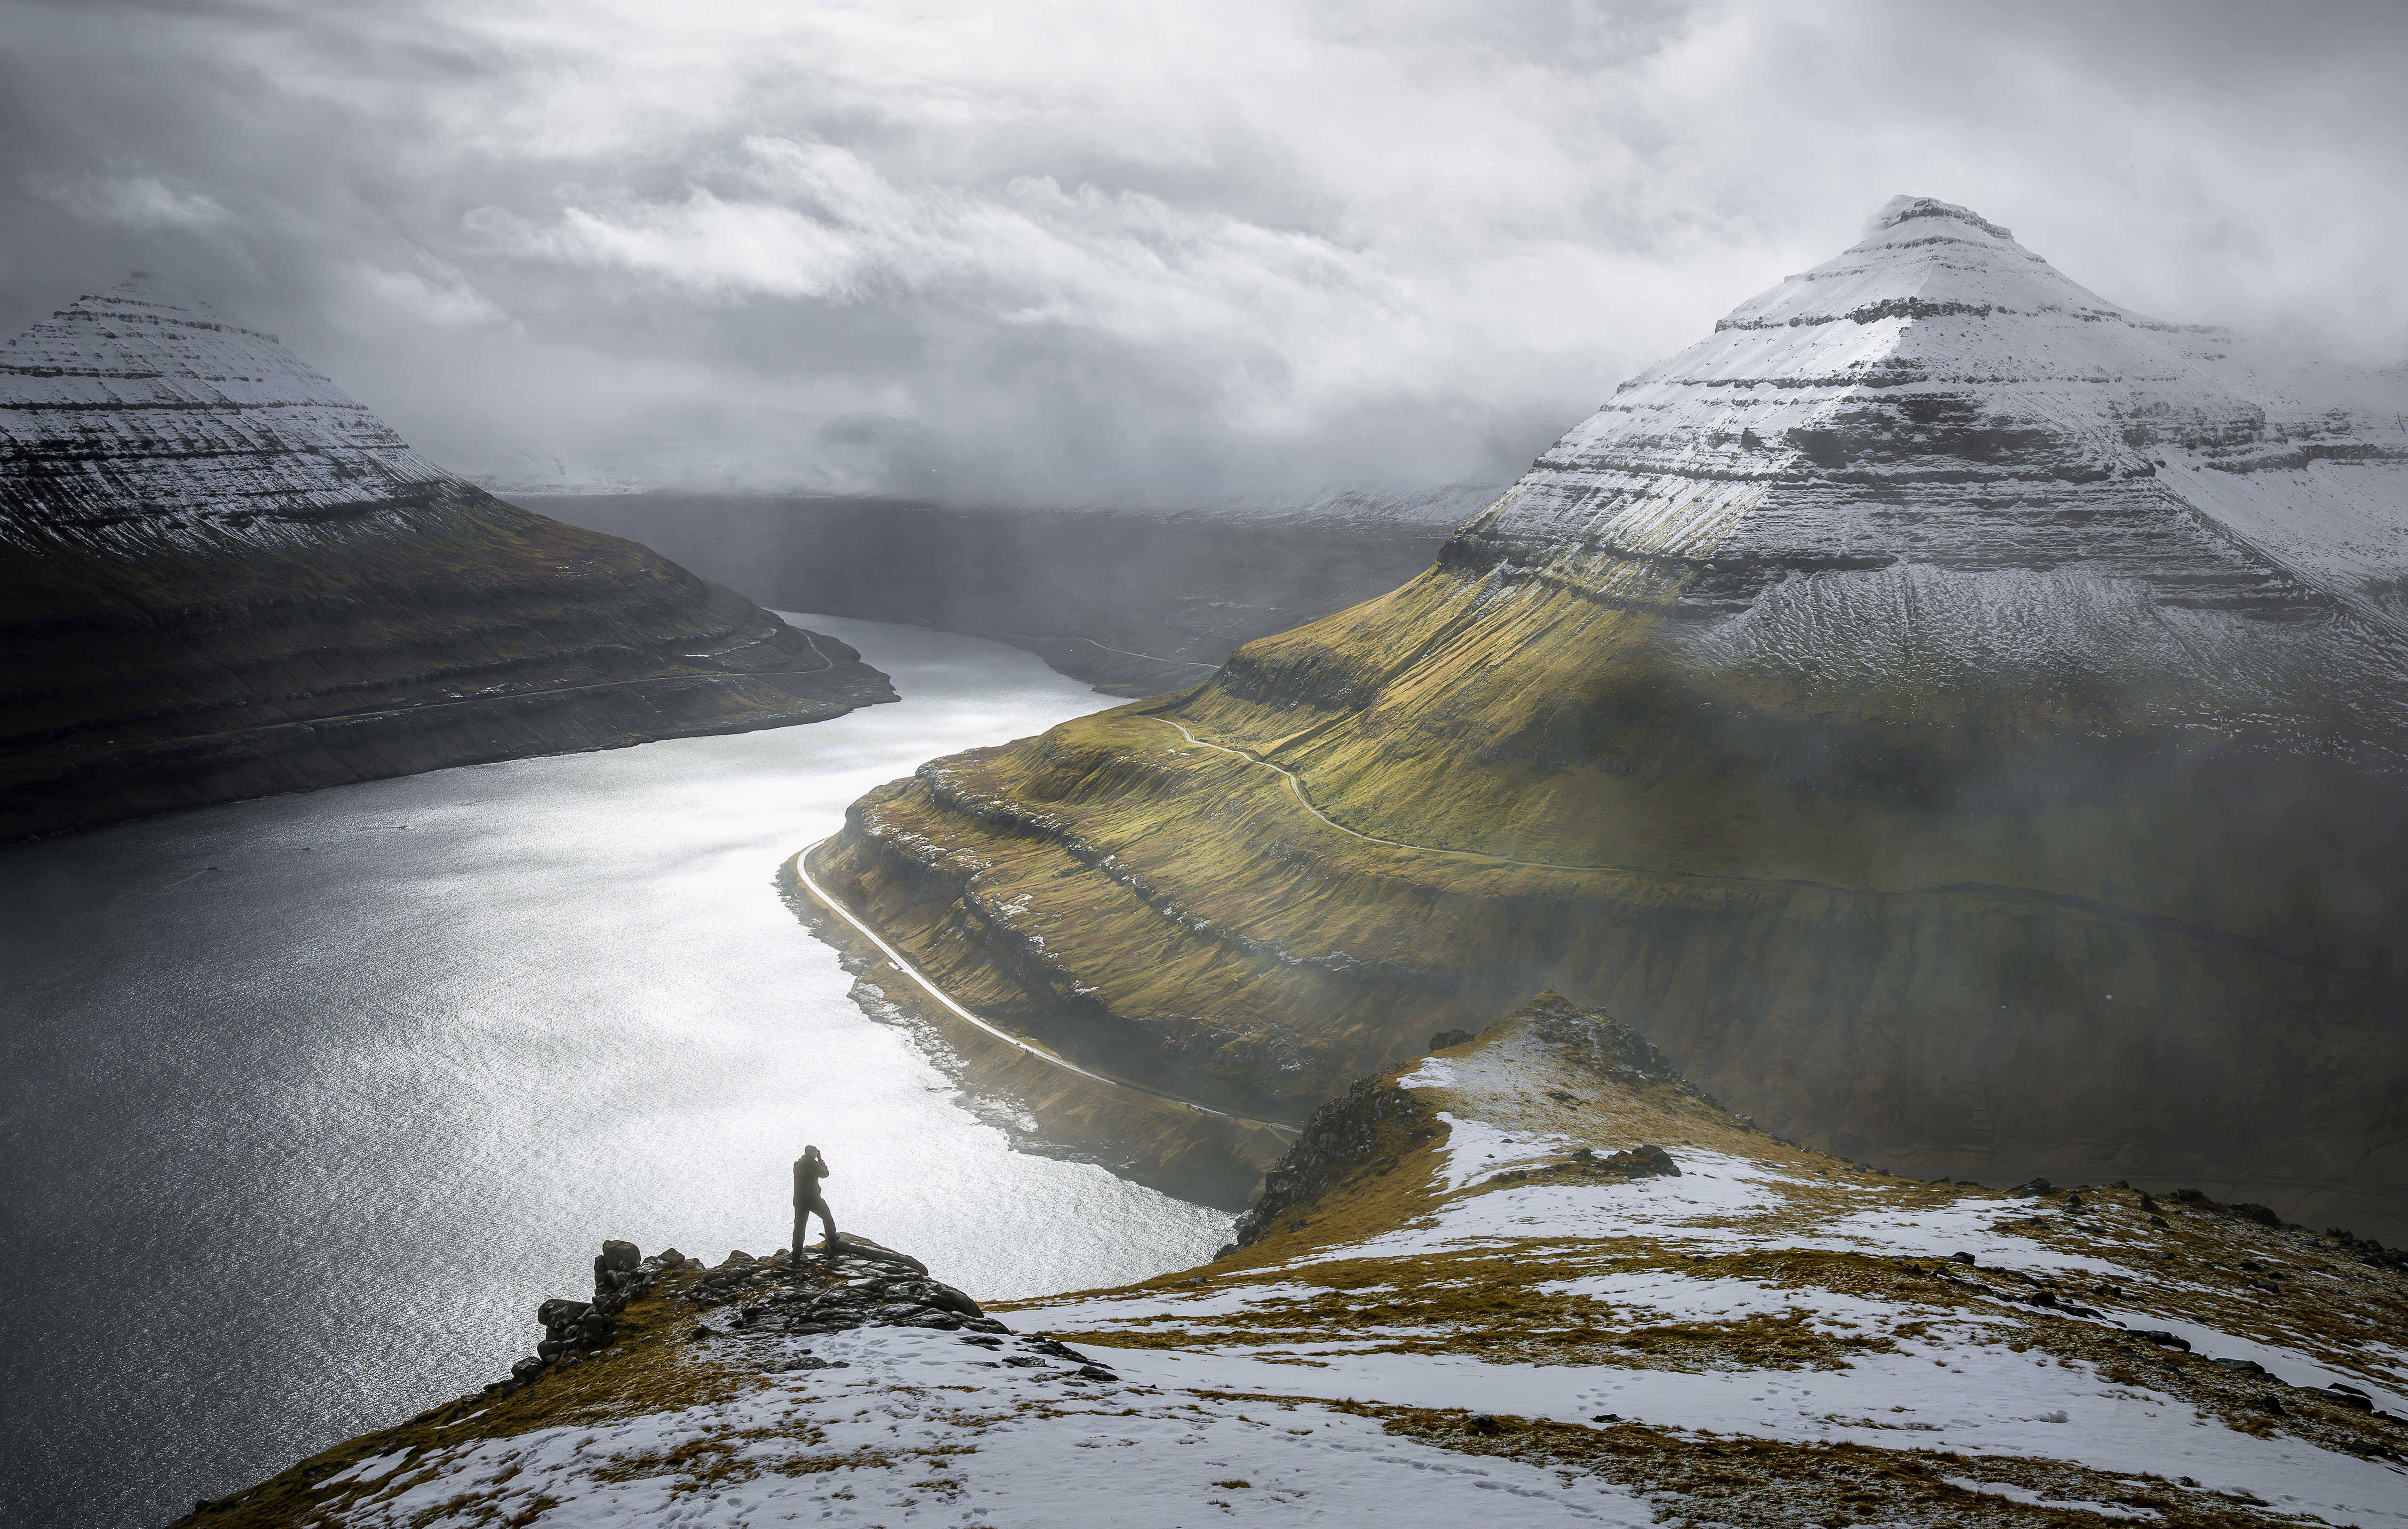 faroes island 4k 1630079636 - Faroes Island 4k - Faroes Island wallpapers, Faroes Island 4k wallpapers